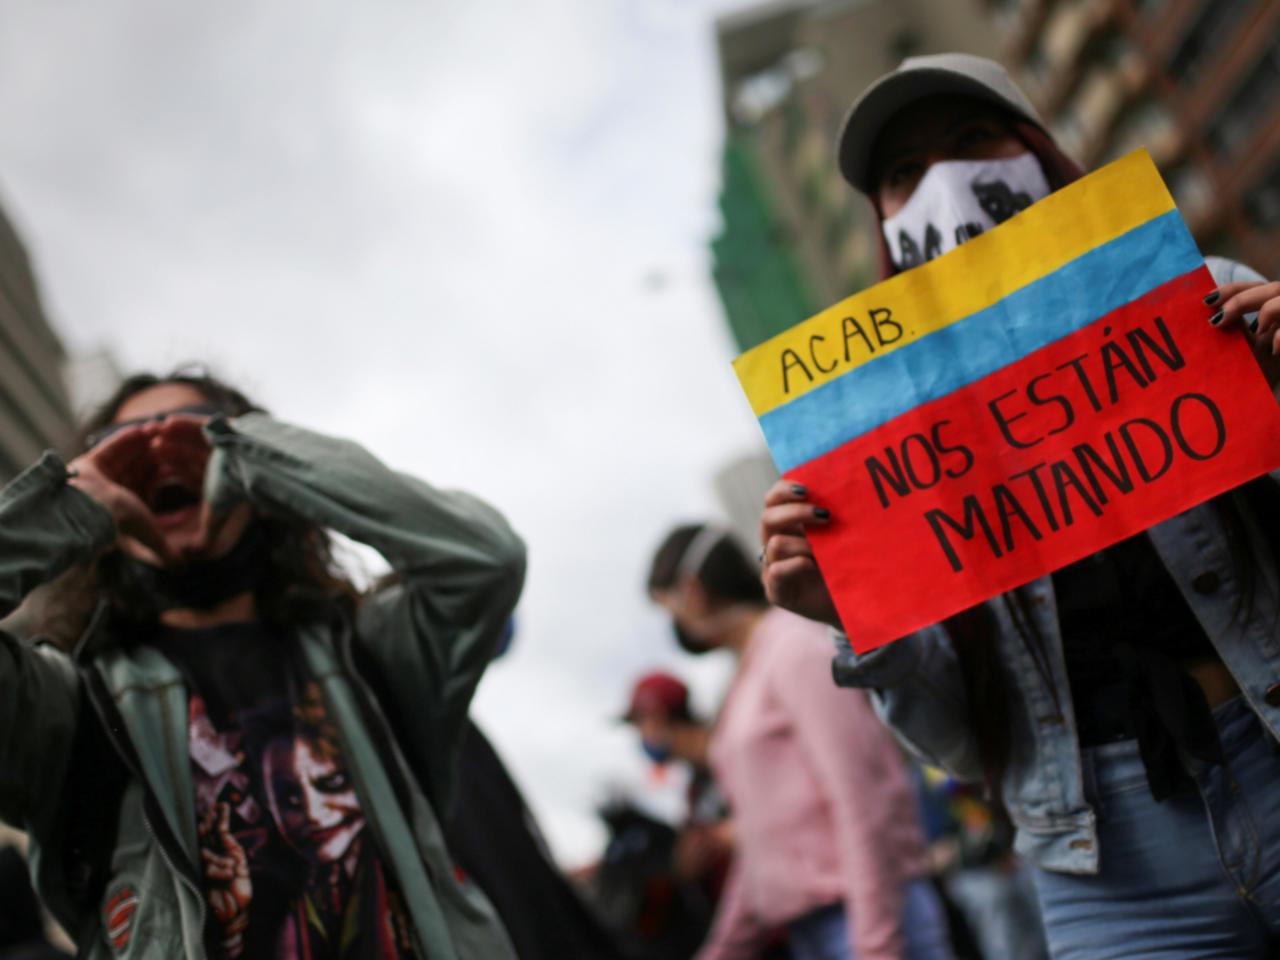 https://misionverdad.com/sites/default/files/Colombia-Masacres-Protestas%20%281%29.jpg